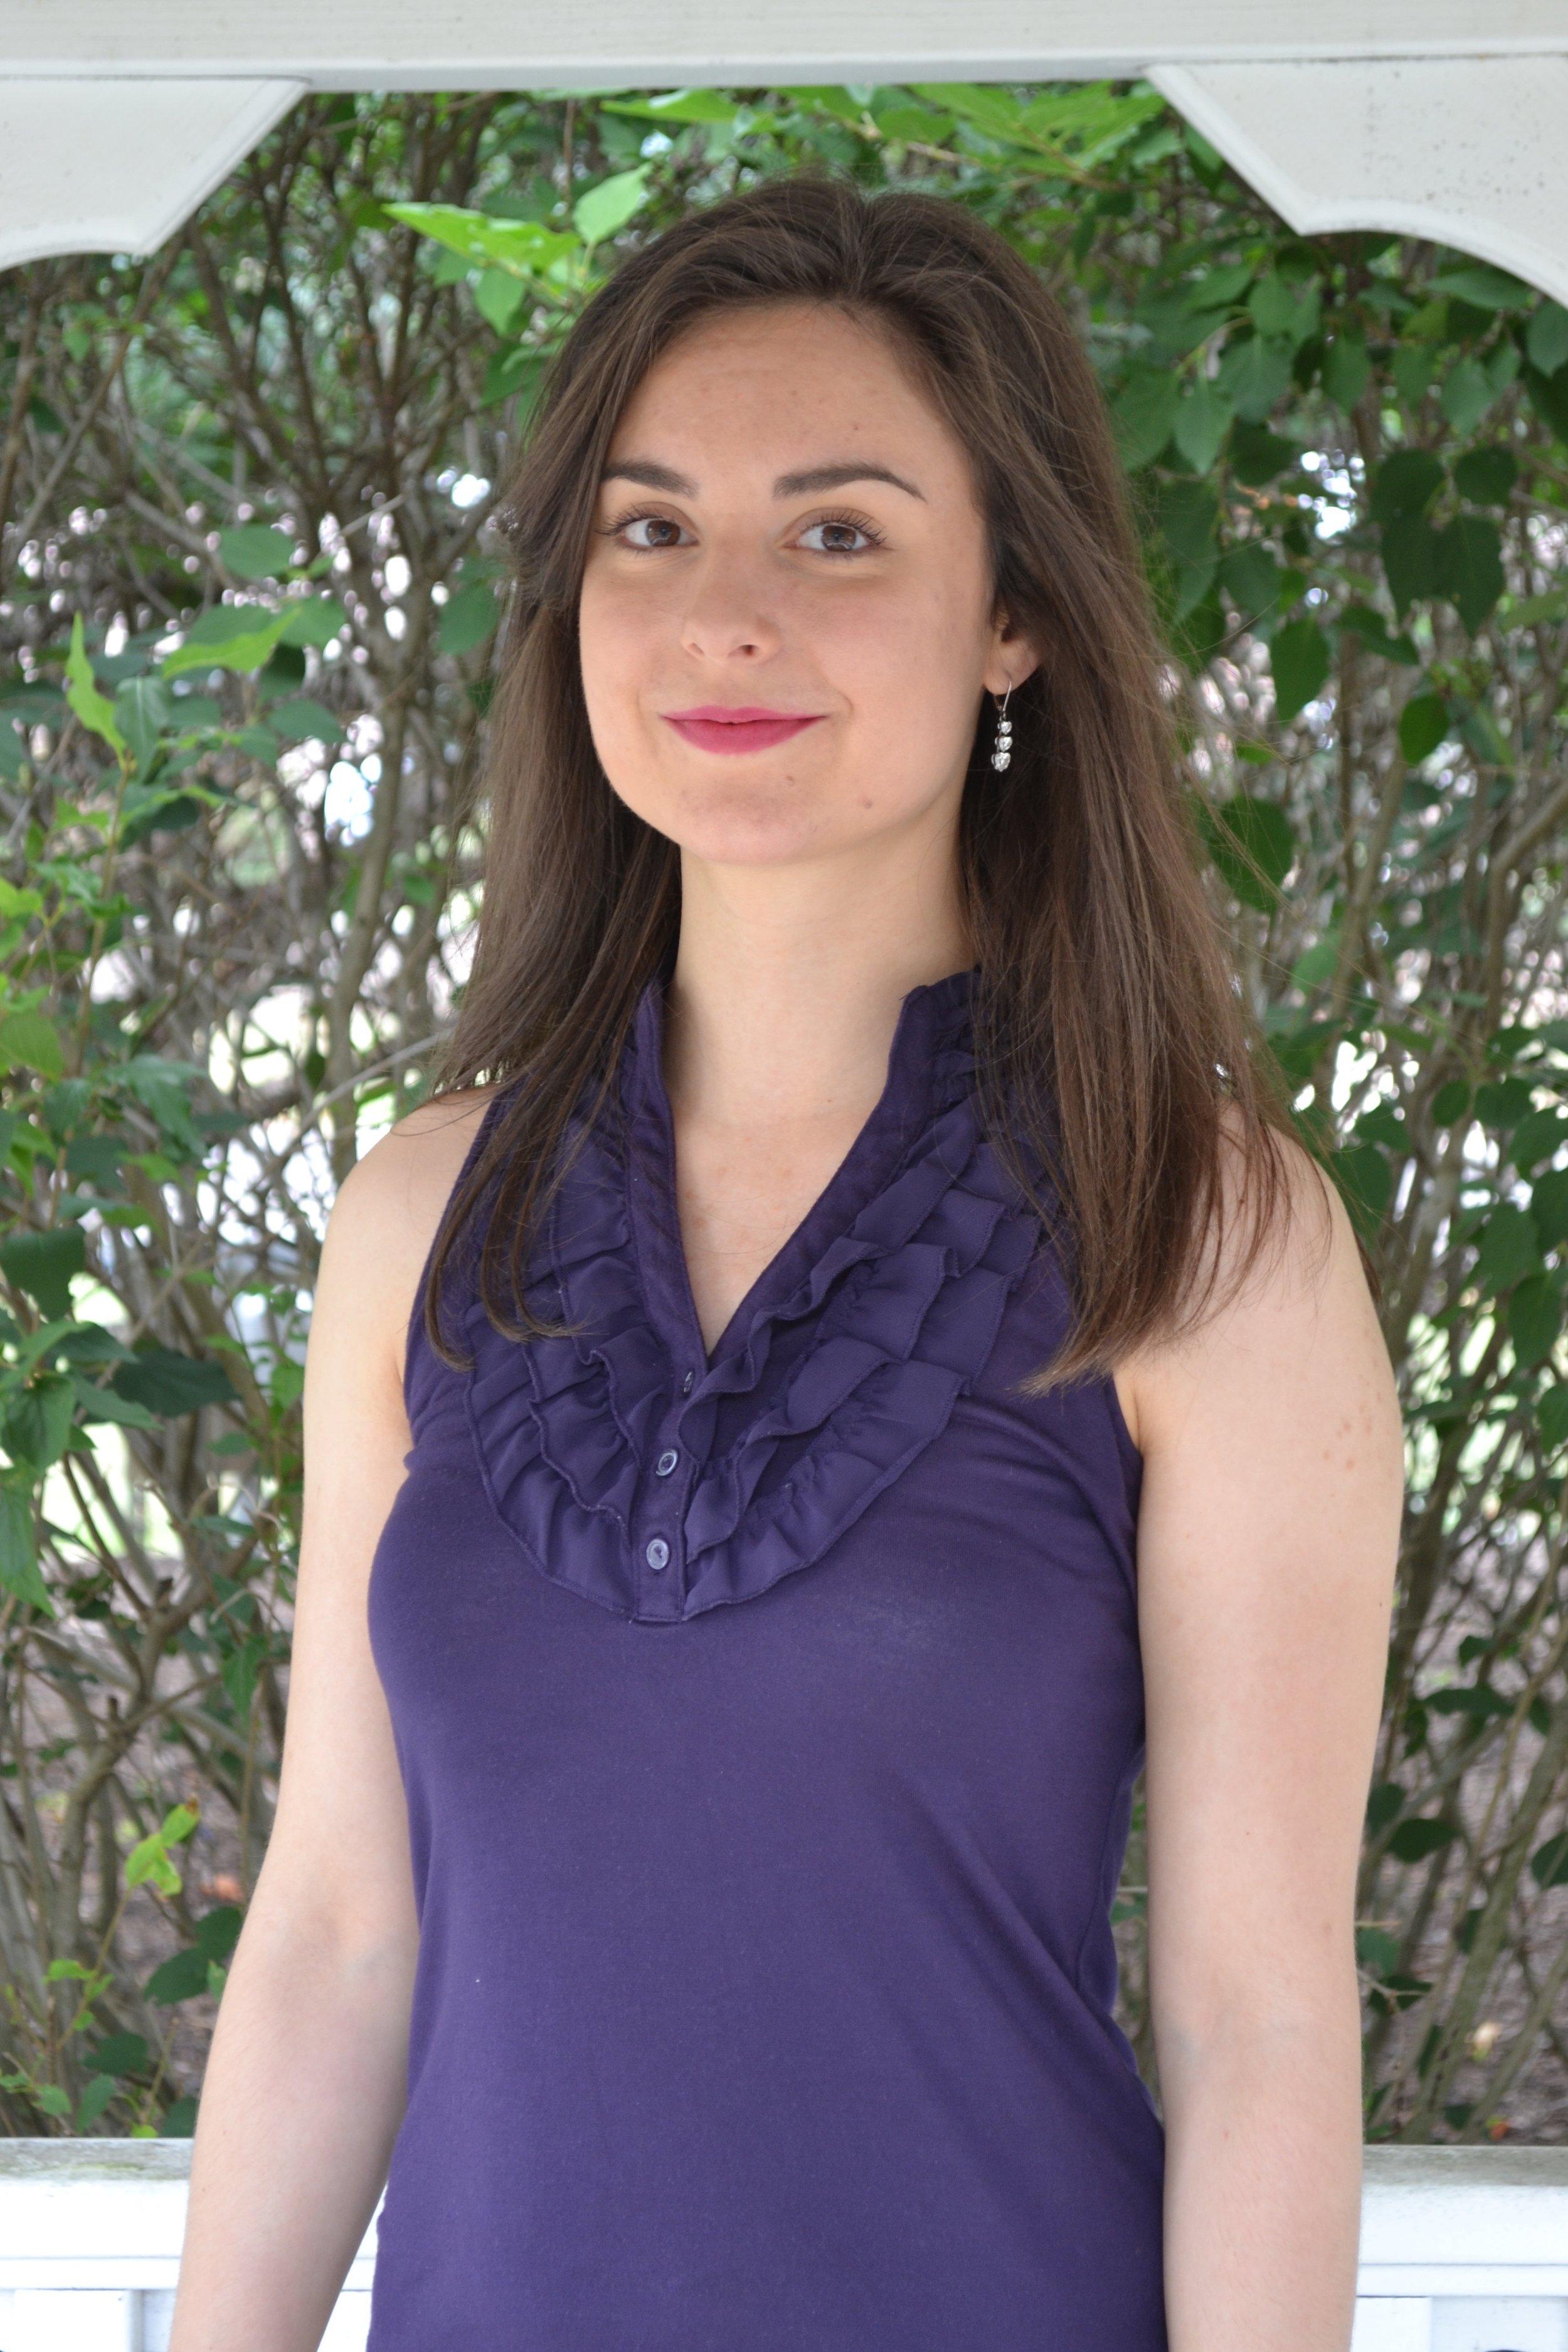 Christie Stratos